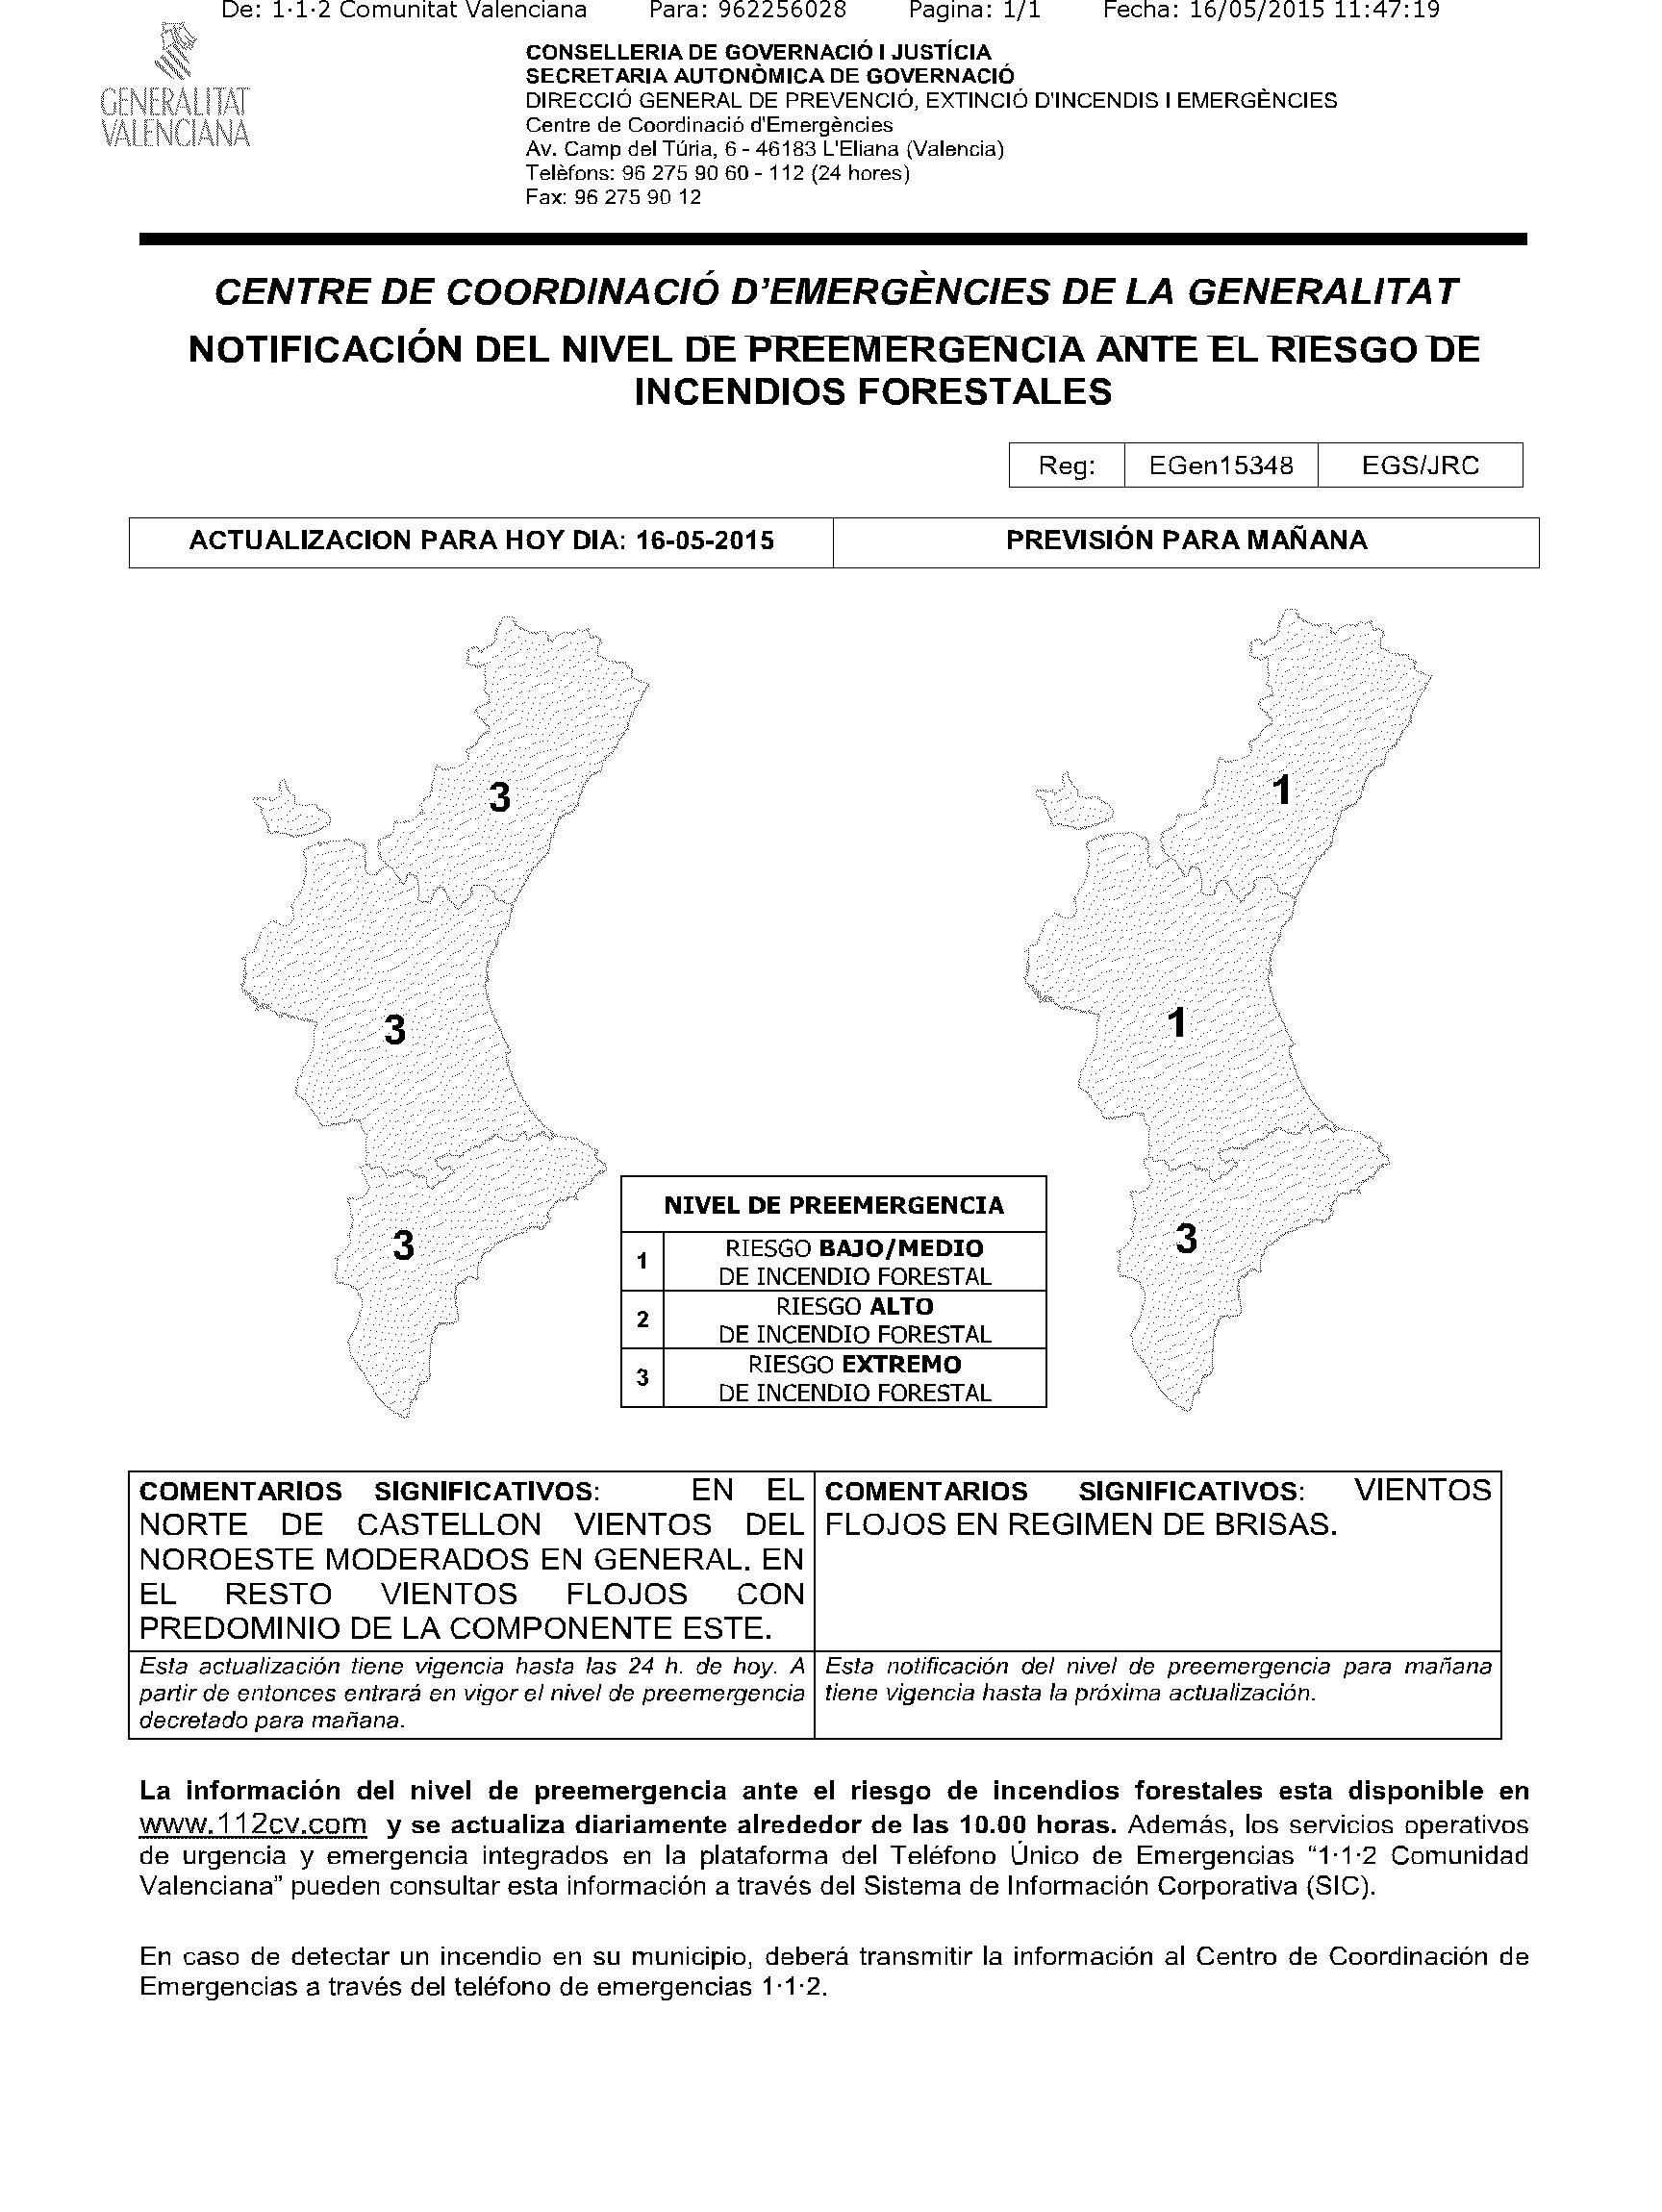 Notificaci³n Nivel Preemergencia Riesgo Incendios Forestales